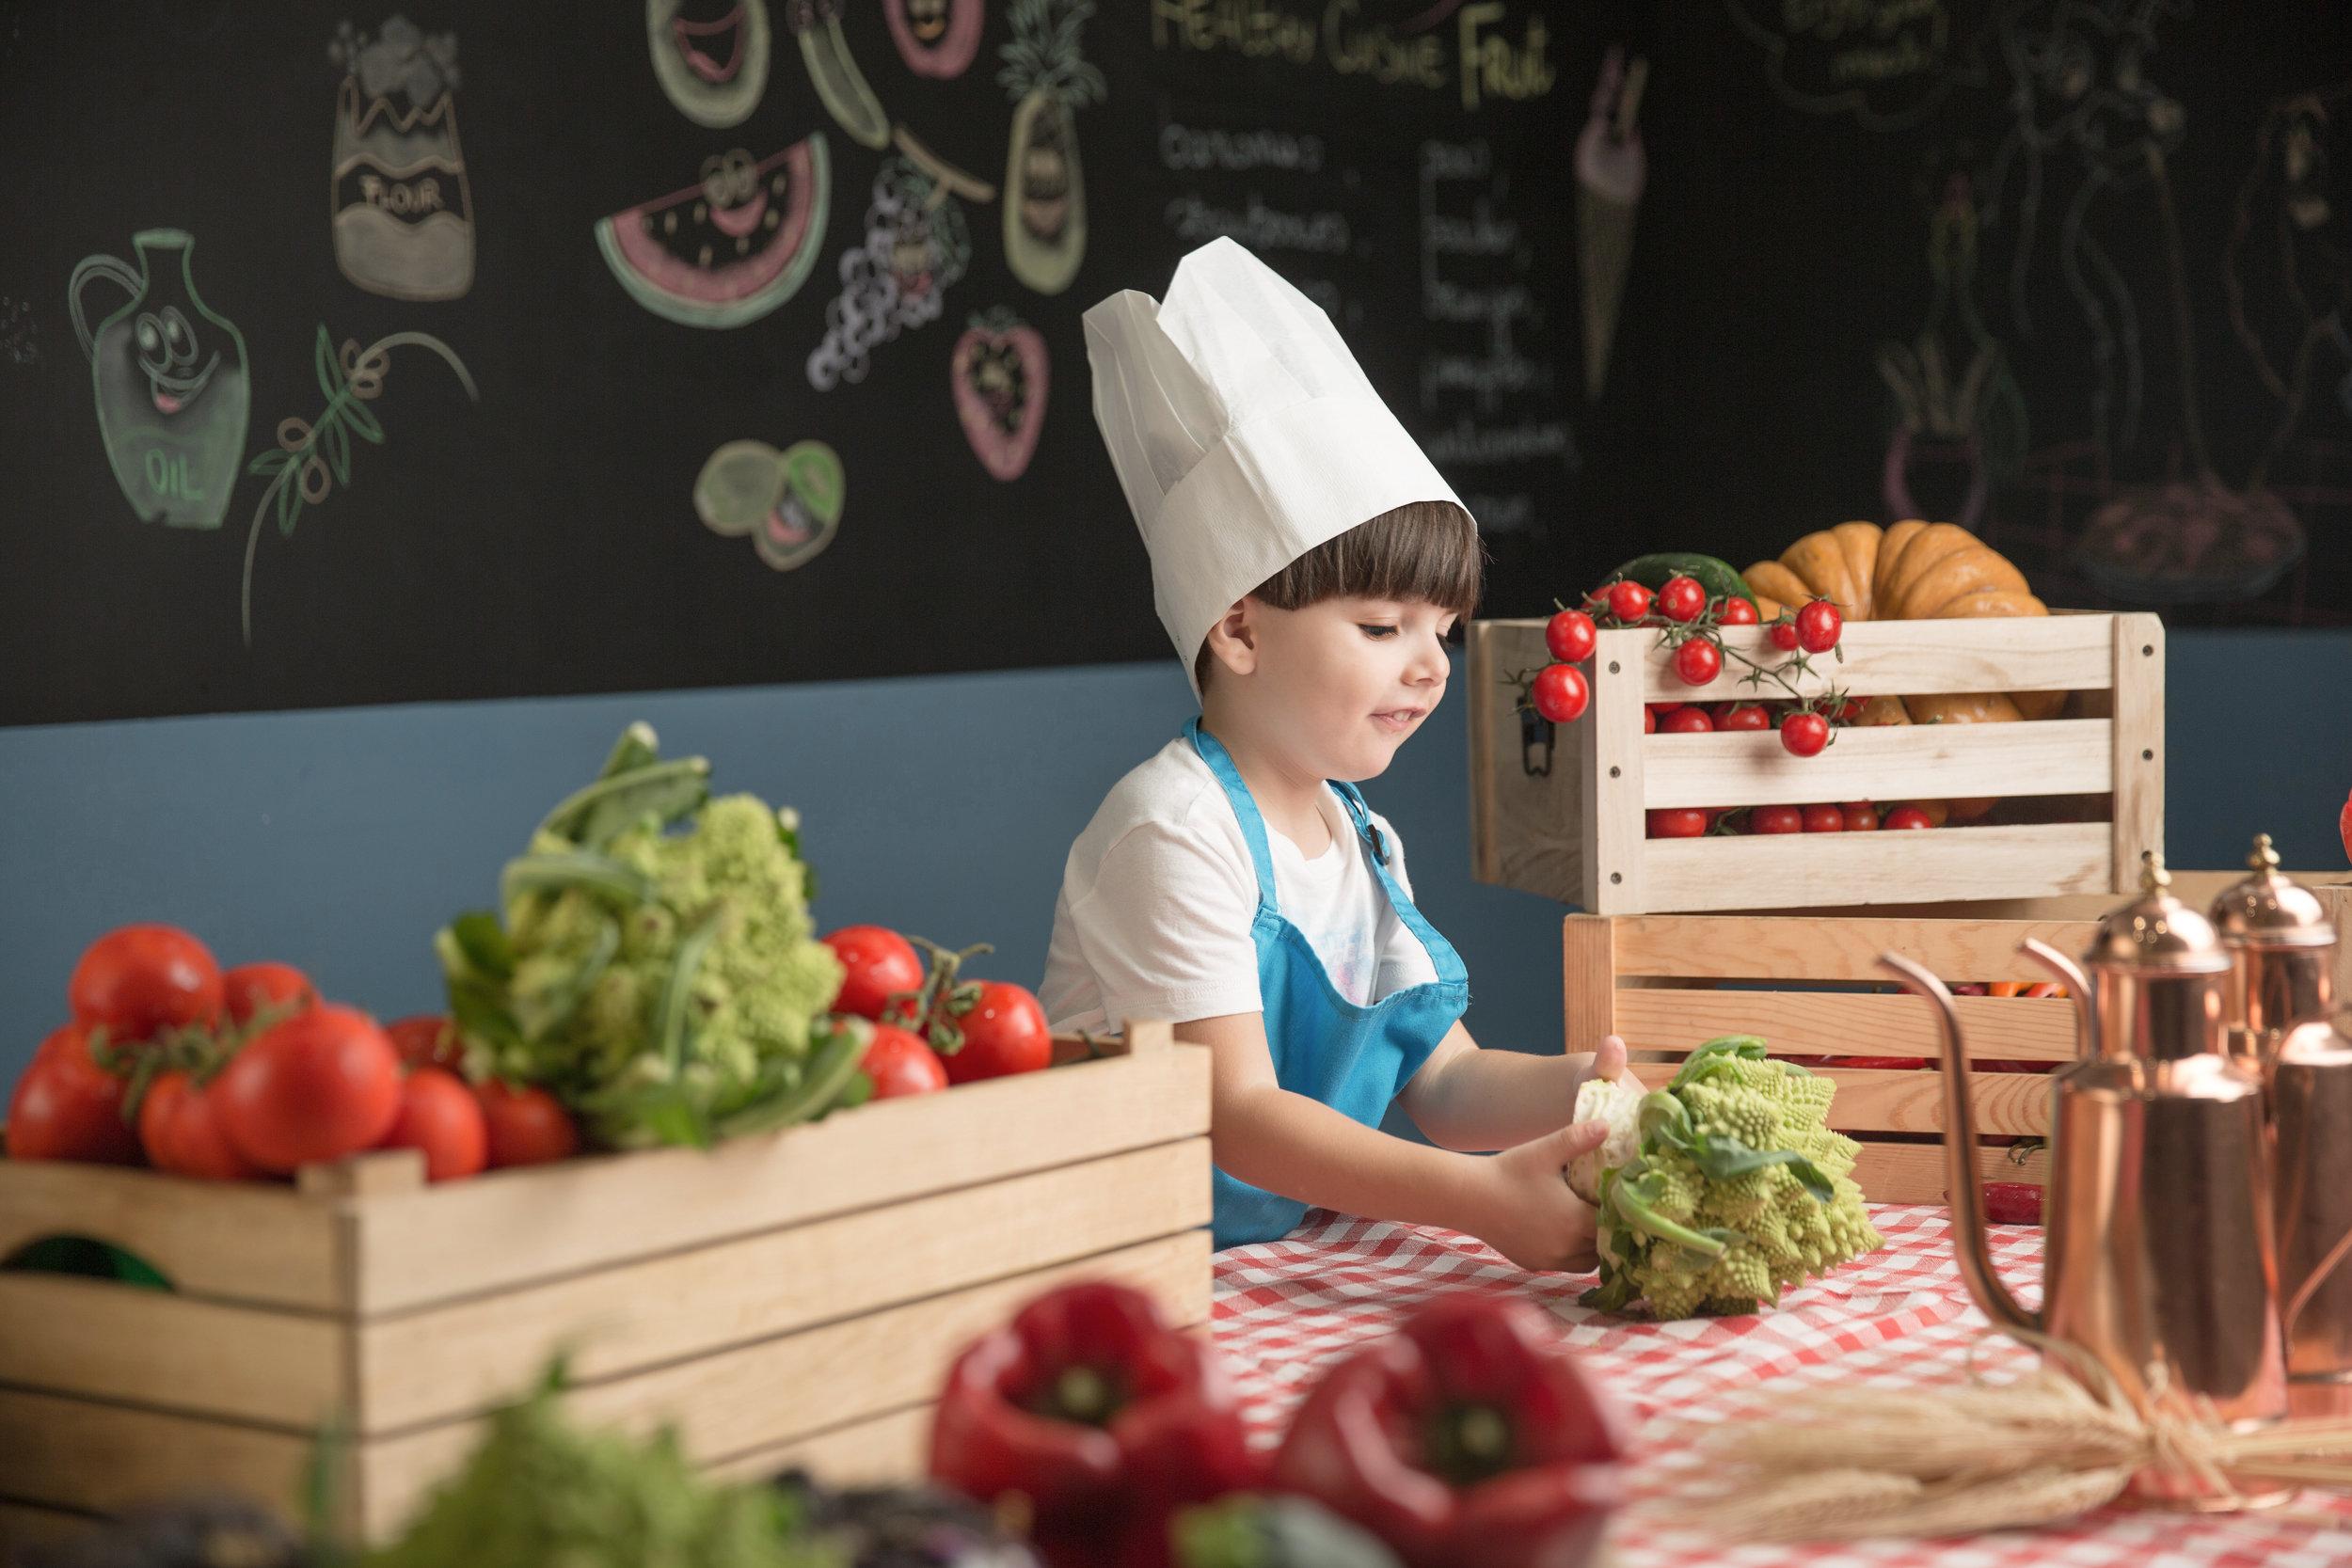 46 Verdura Golf & Spa Resort -Verdùland - Healthy cuisine lesson-Jan17.jpg